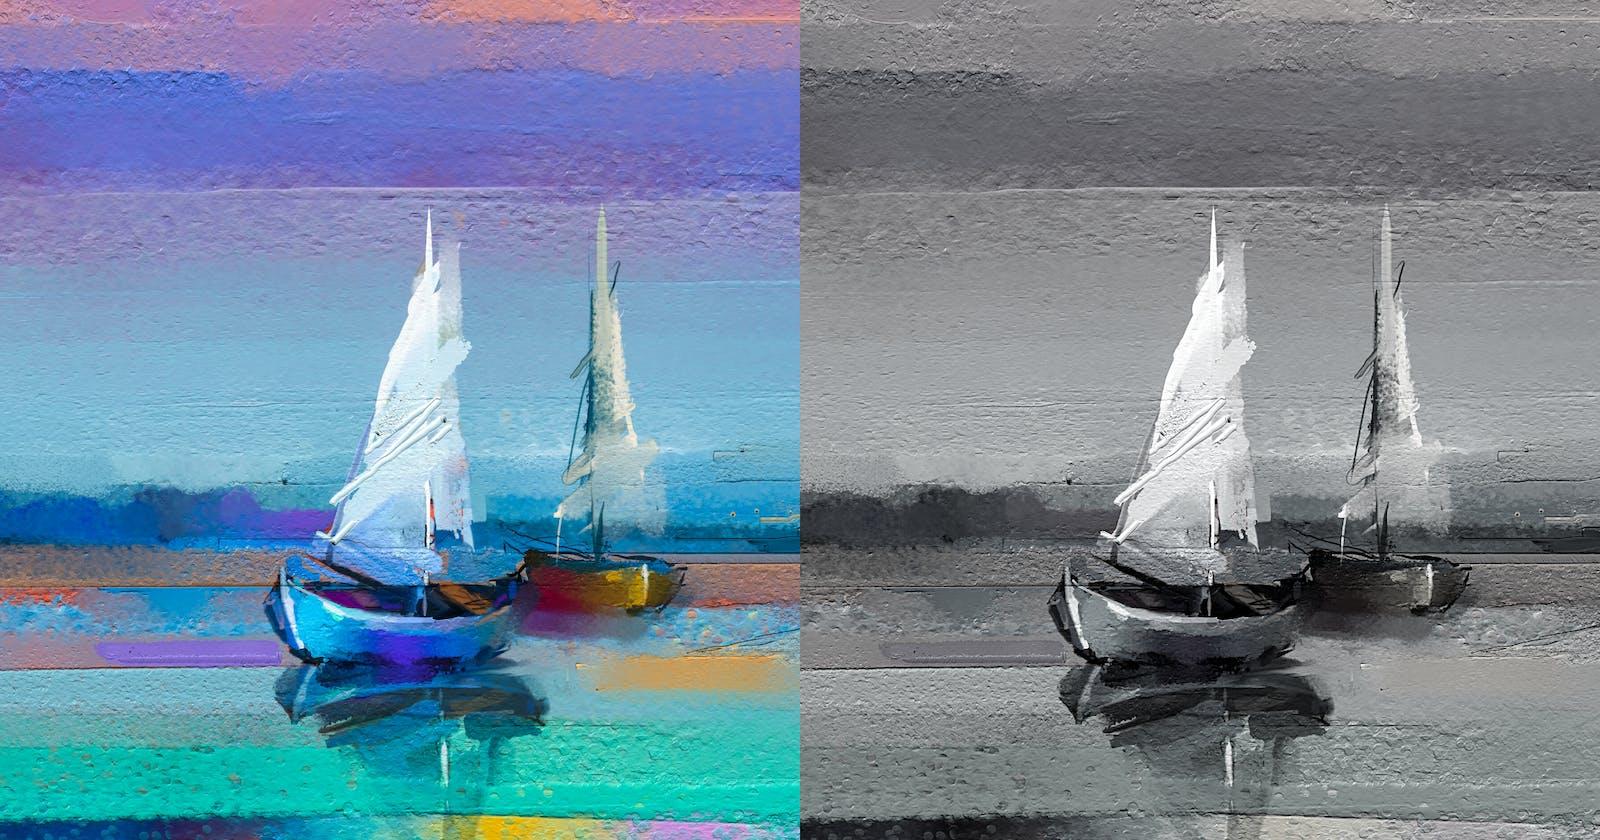 Image Editor using CamanJS